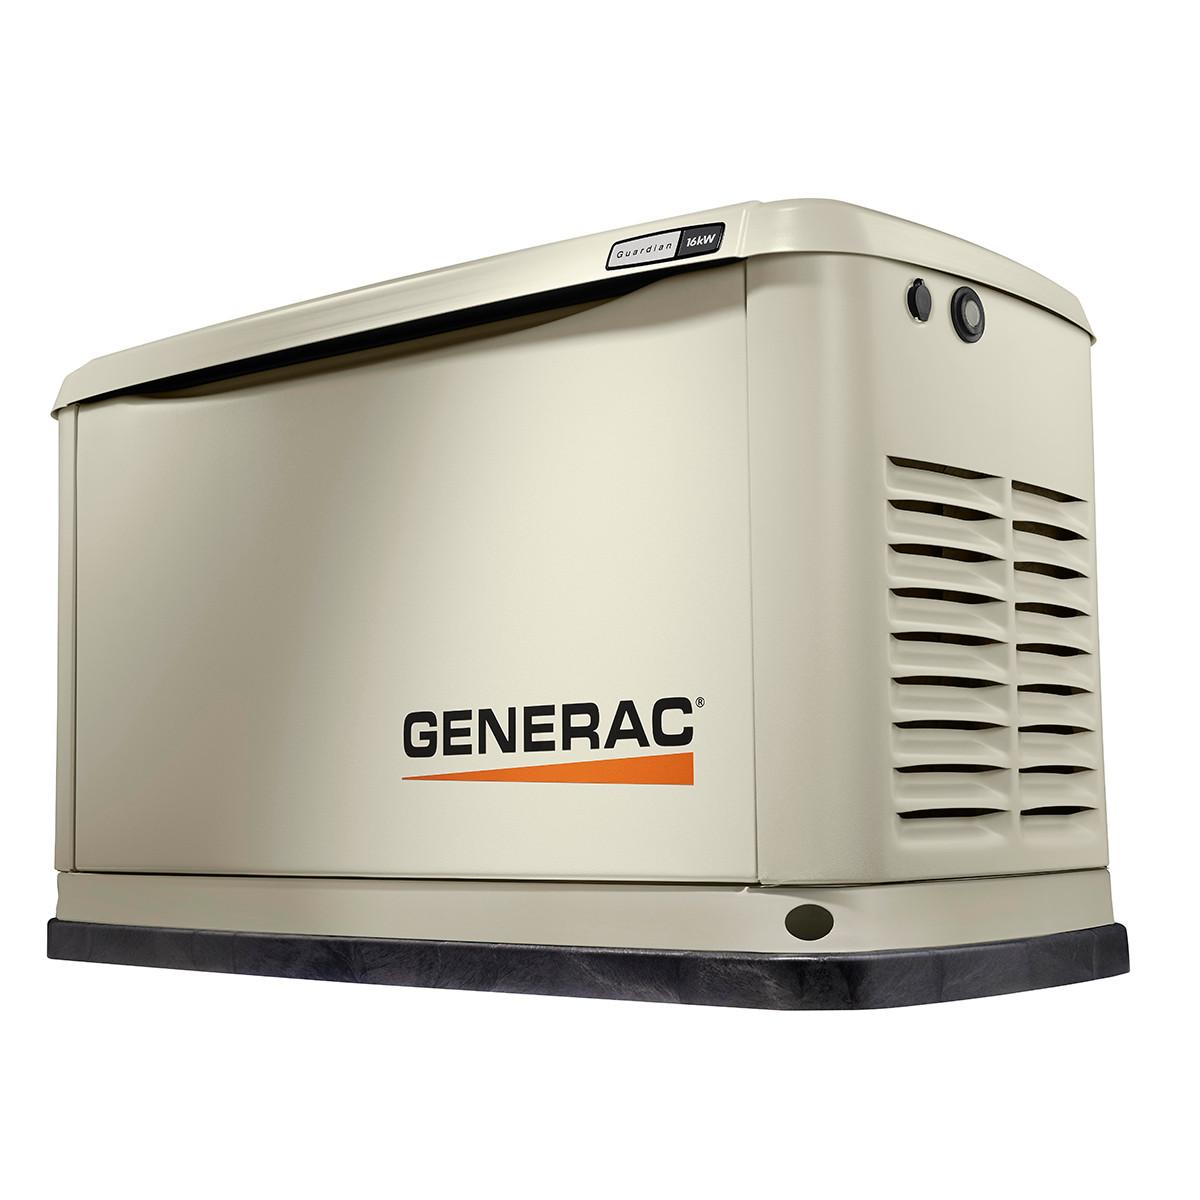 medium resolution of generac guardian 7035 16kw generator with wi fi